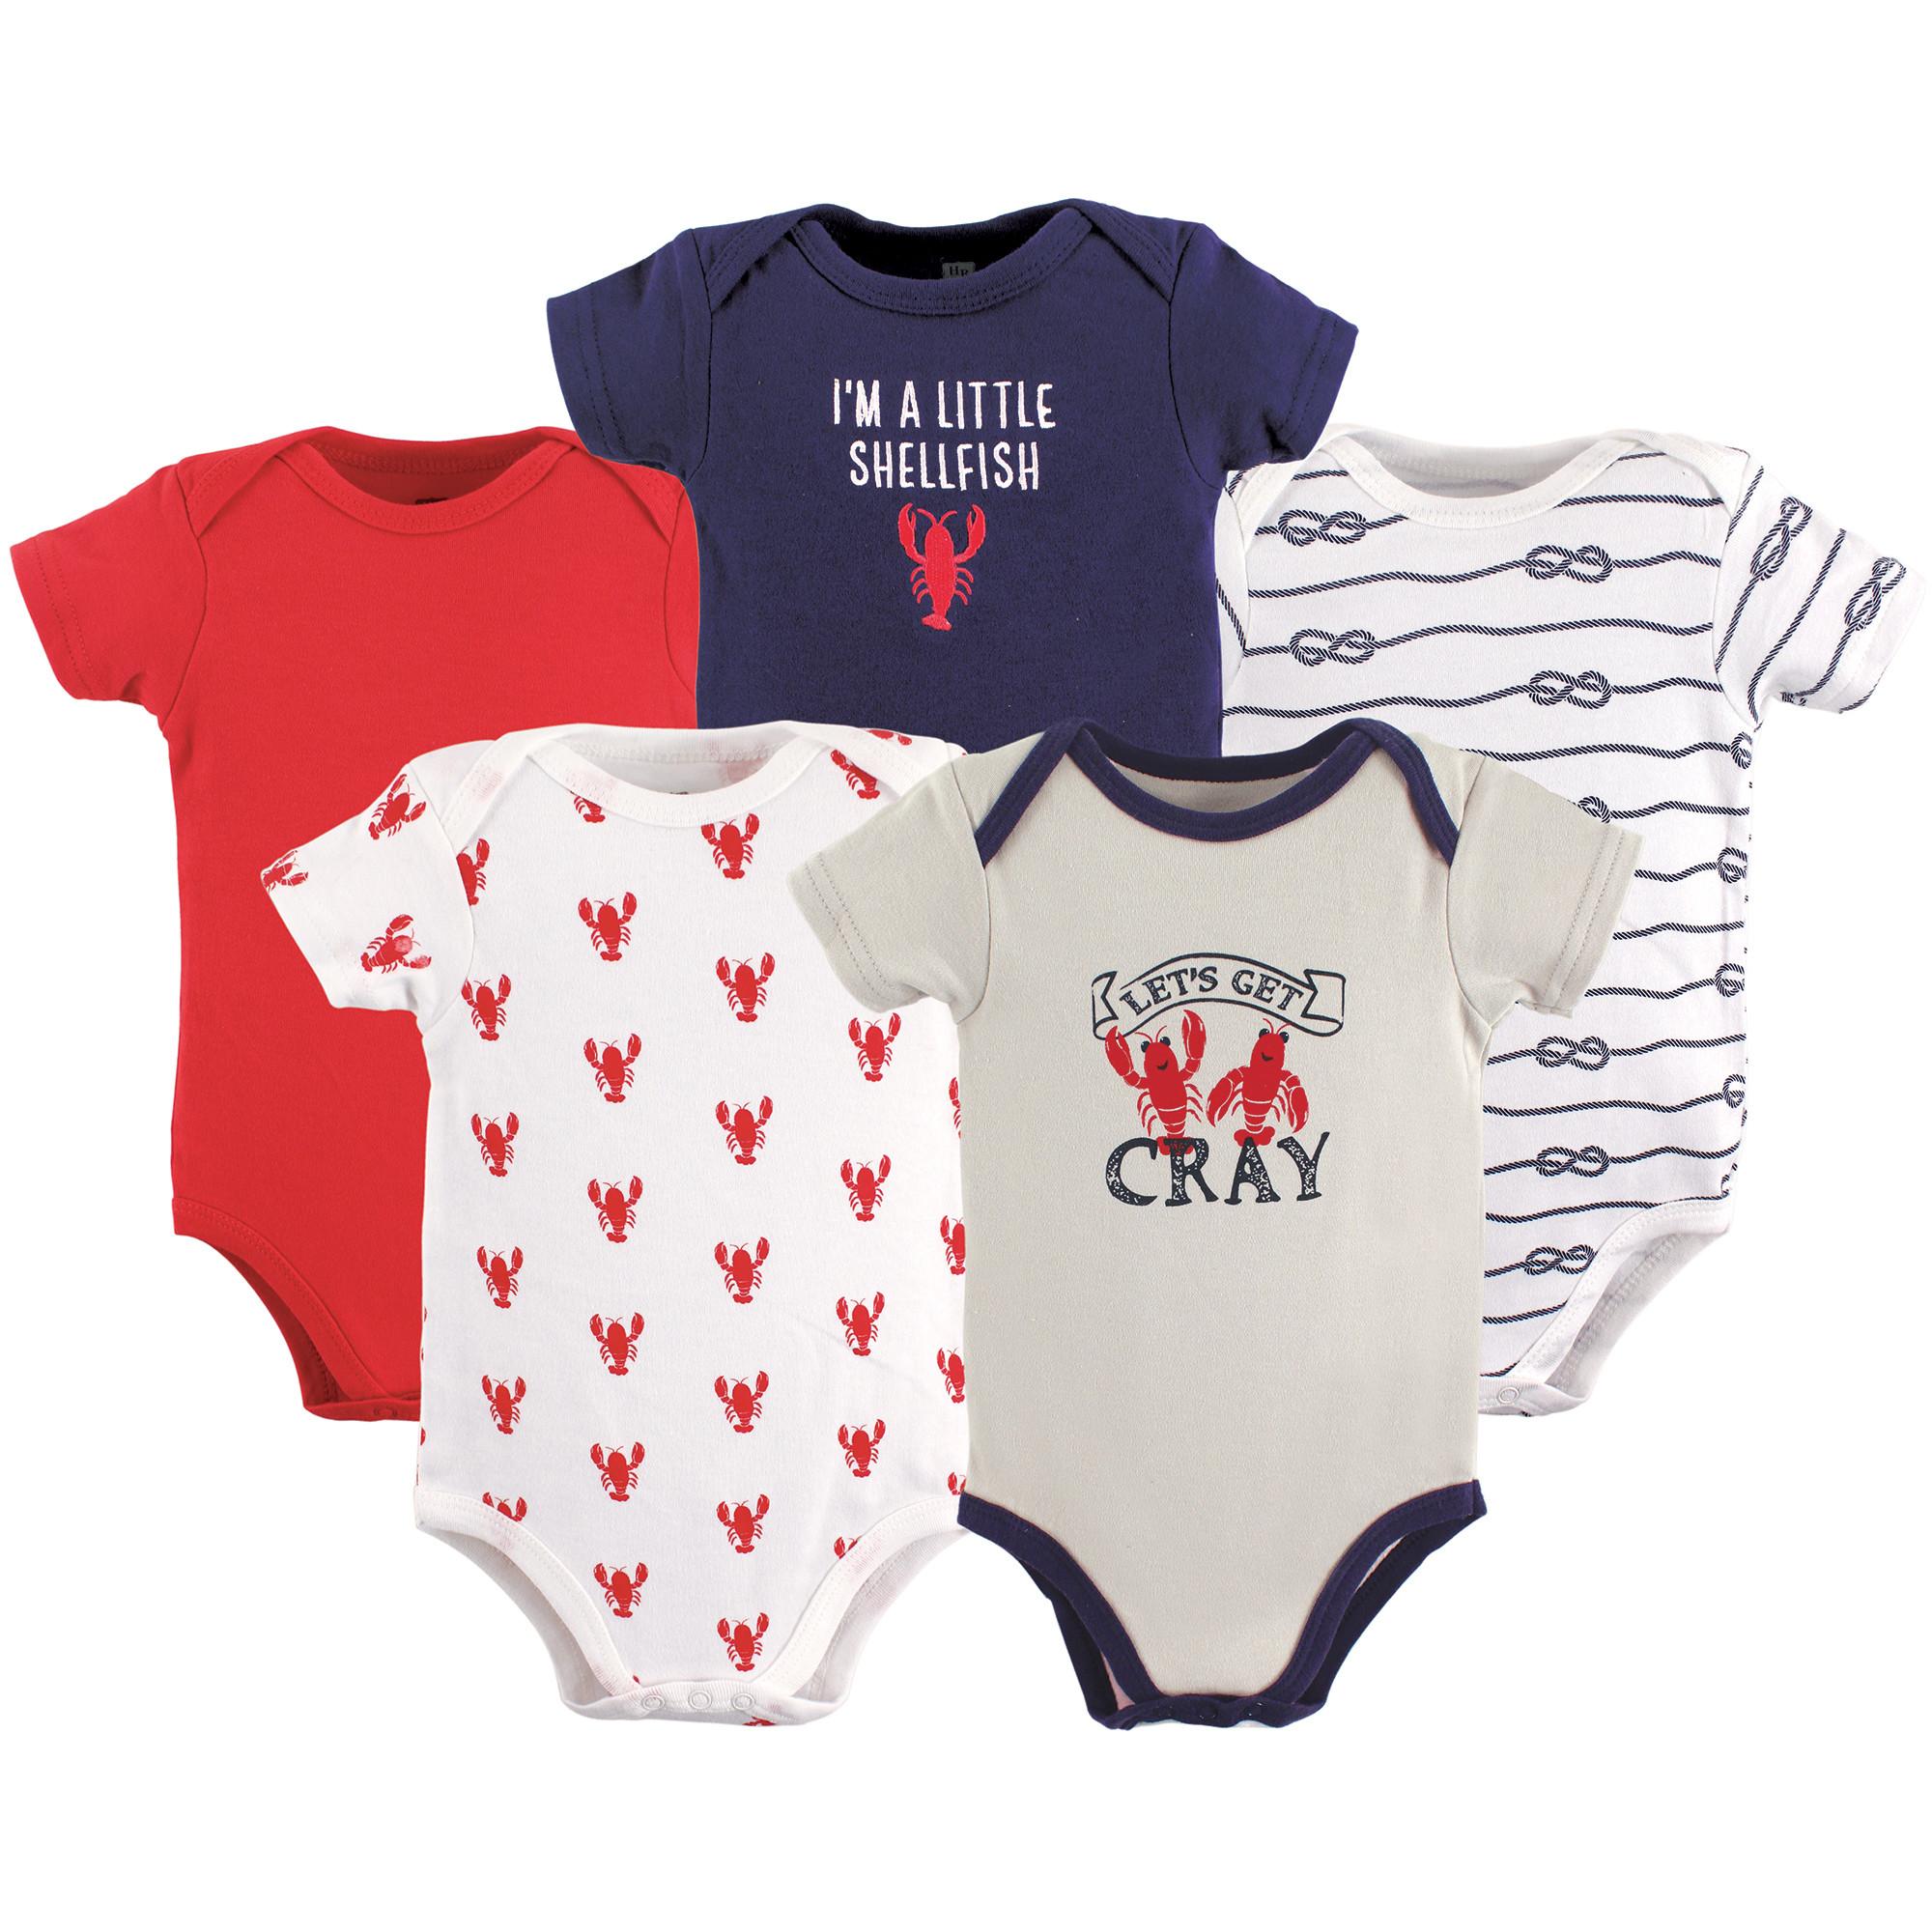 Hudson baby Clothing